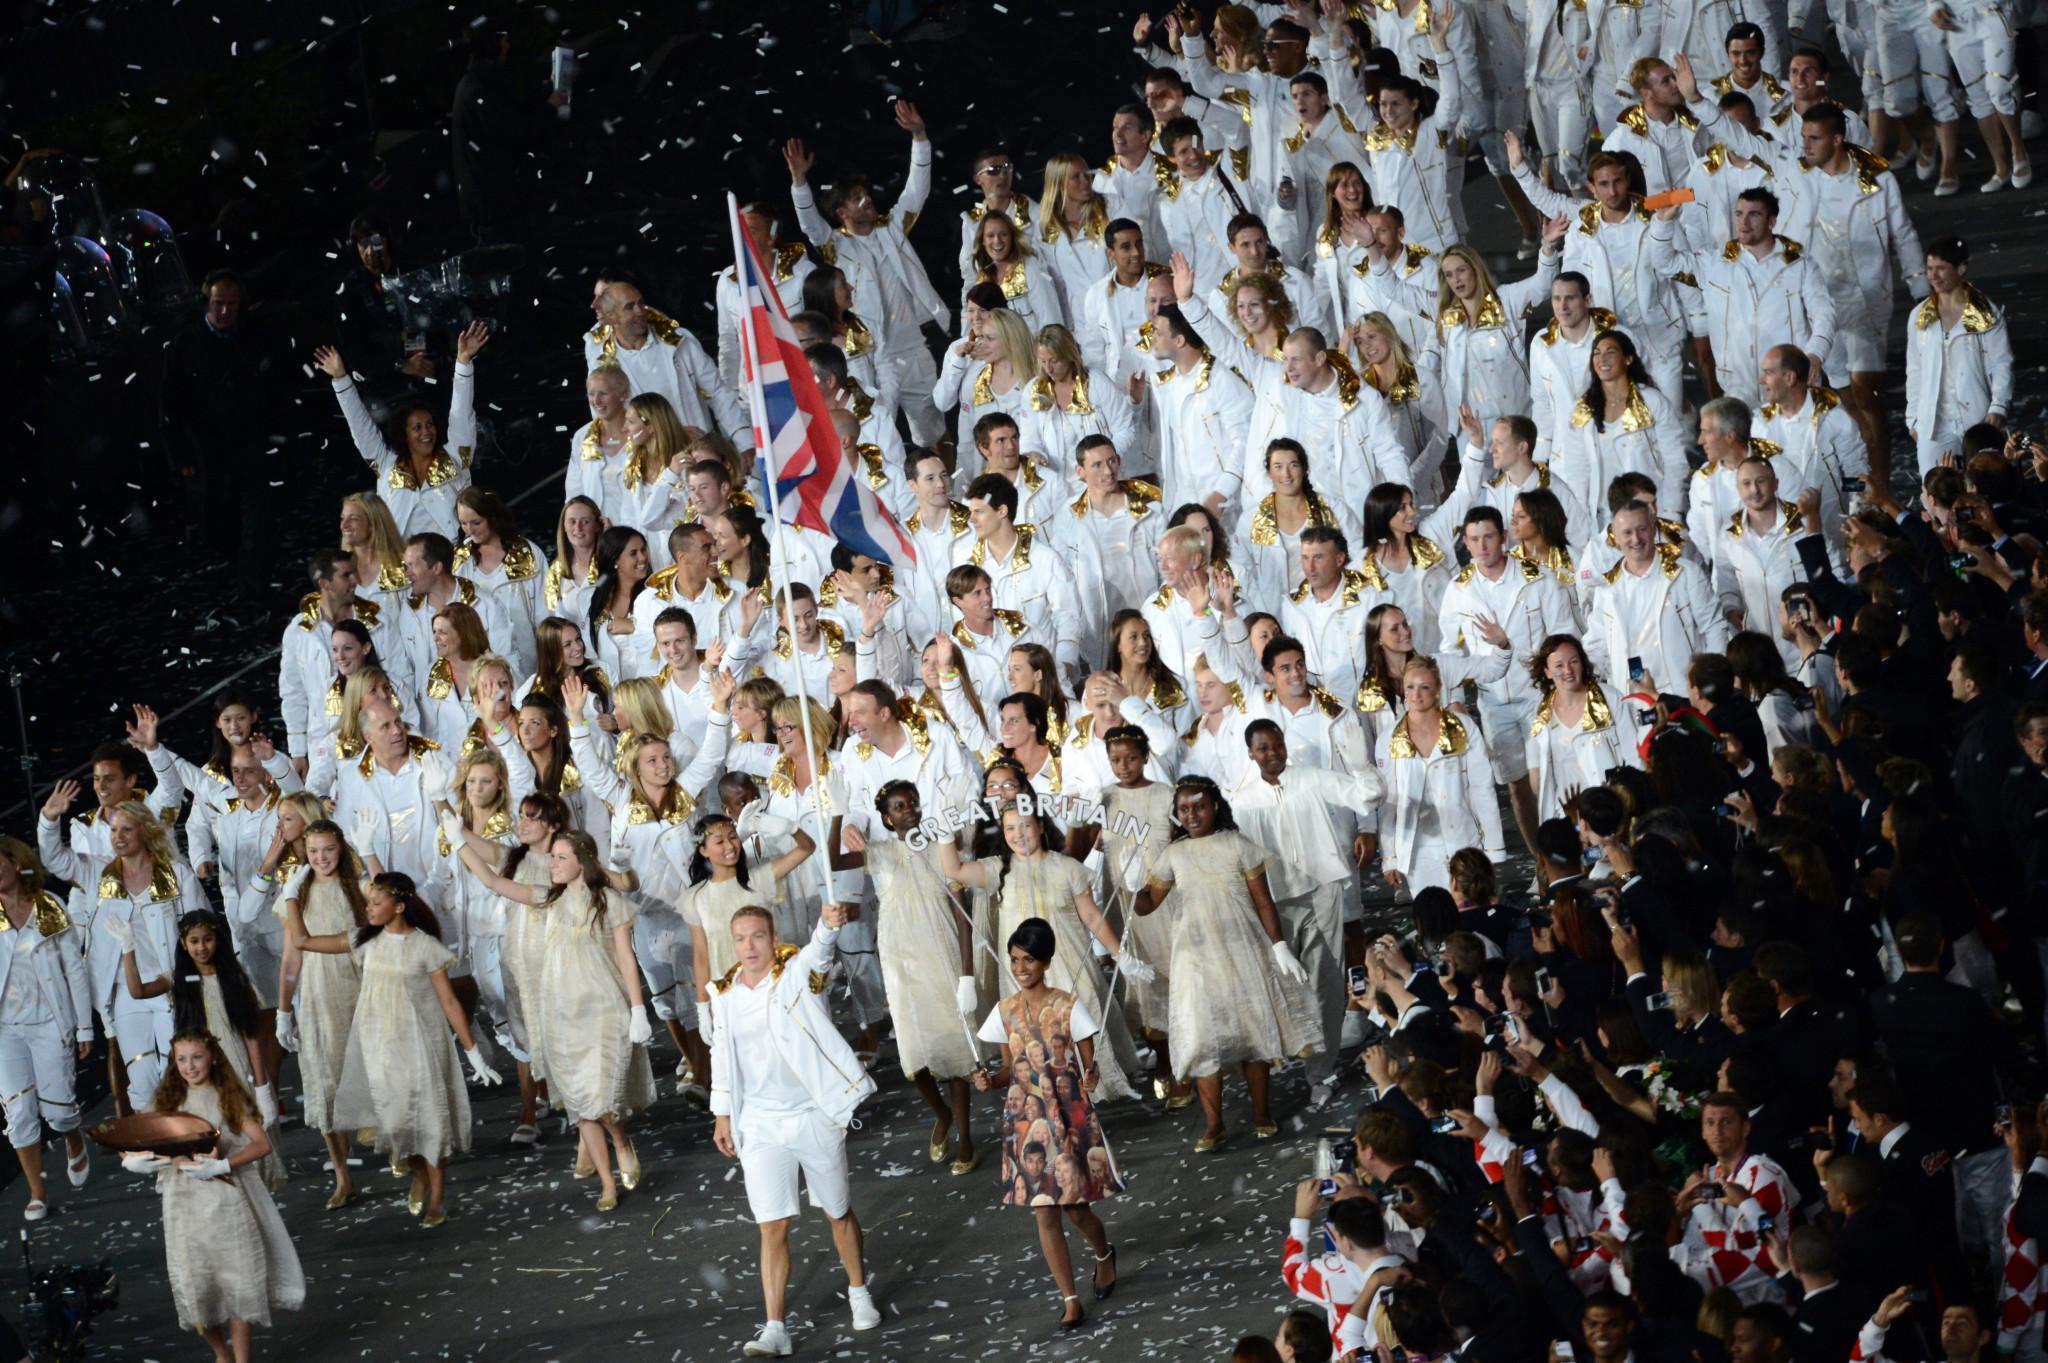 London menjadi tuan rumah Olimpiade dan Paralimpiade pada tahun 2012, menjadi kota pertama yang menjadi tuan rumah Olimpiade tiga kali © Getty Images